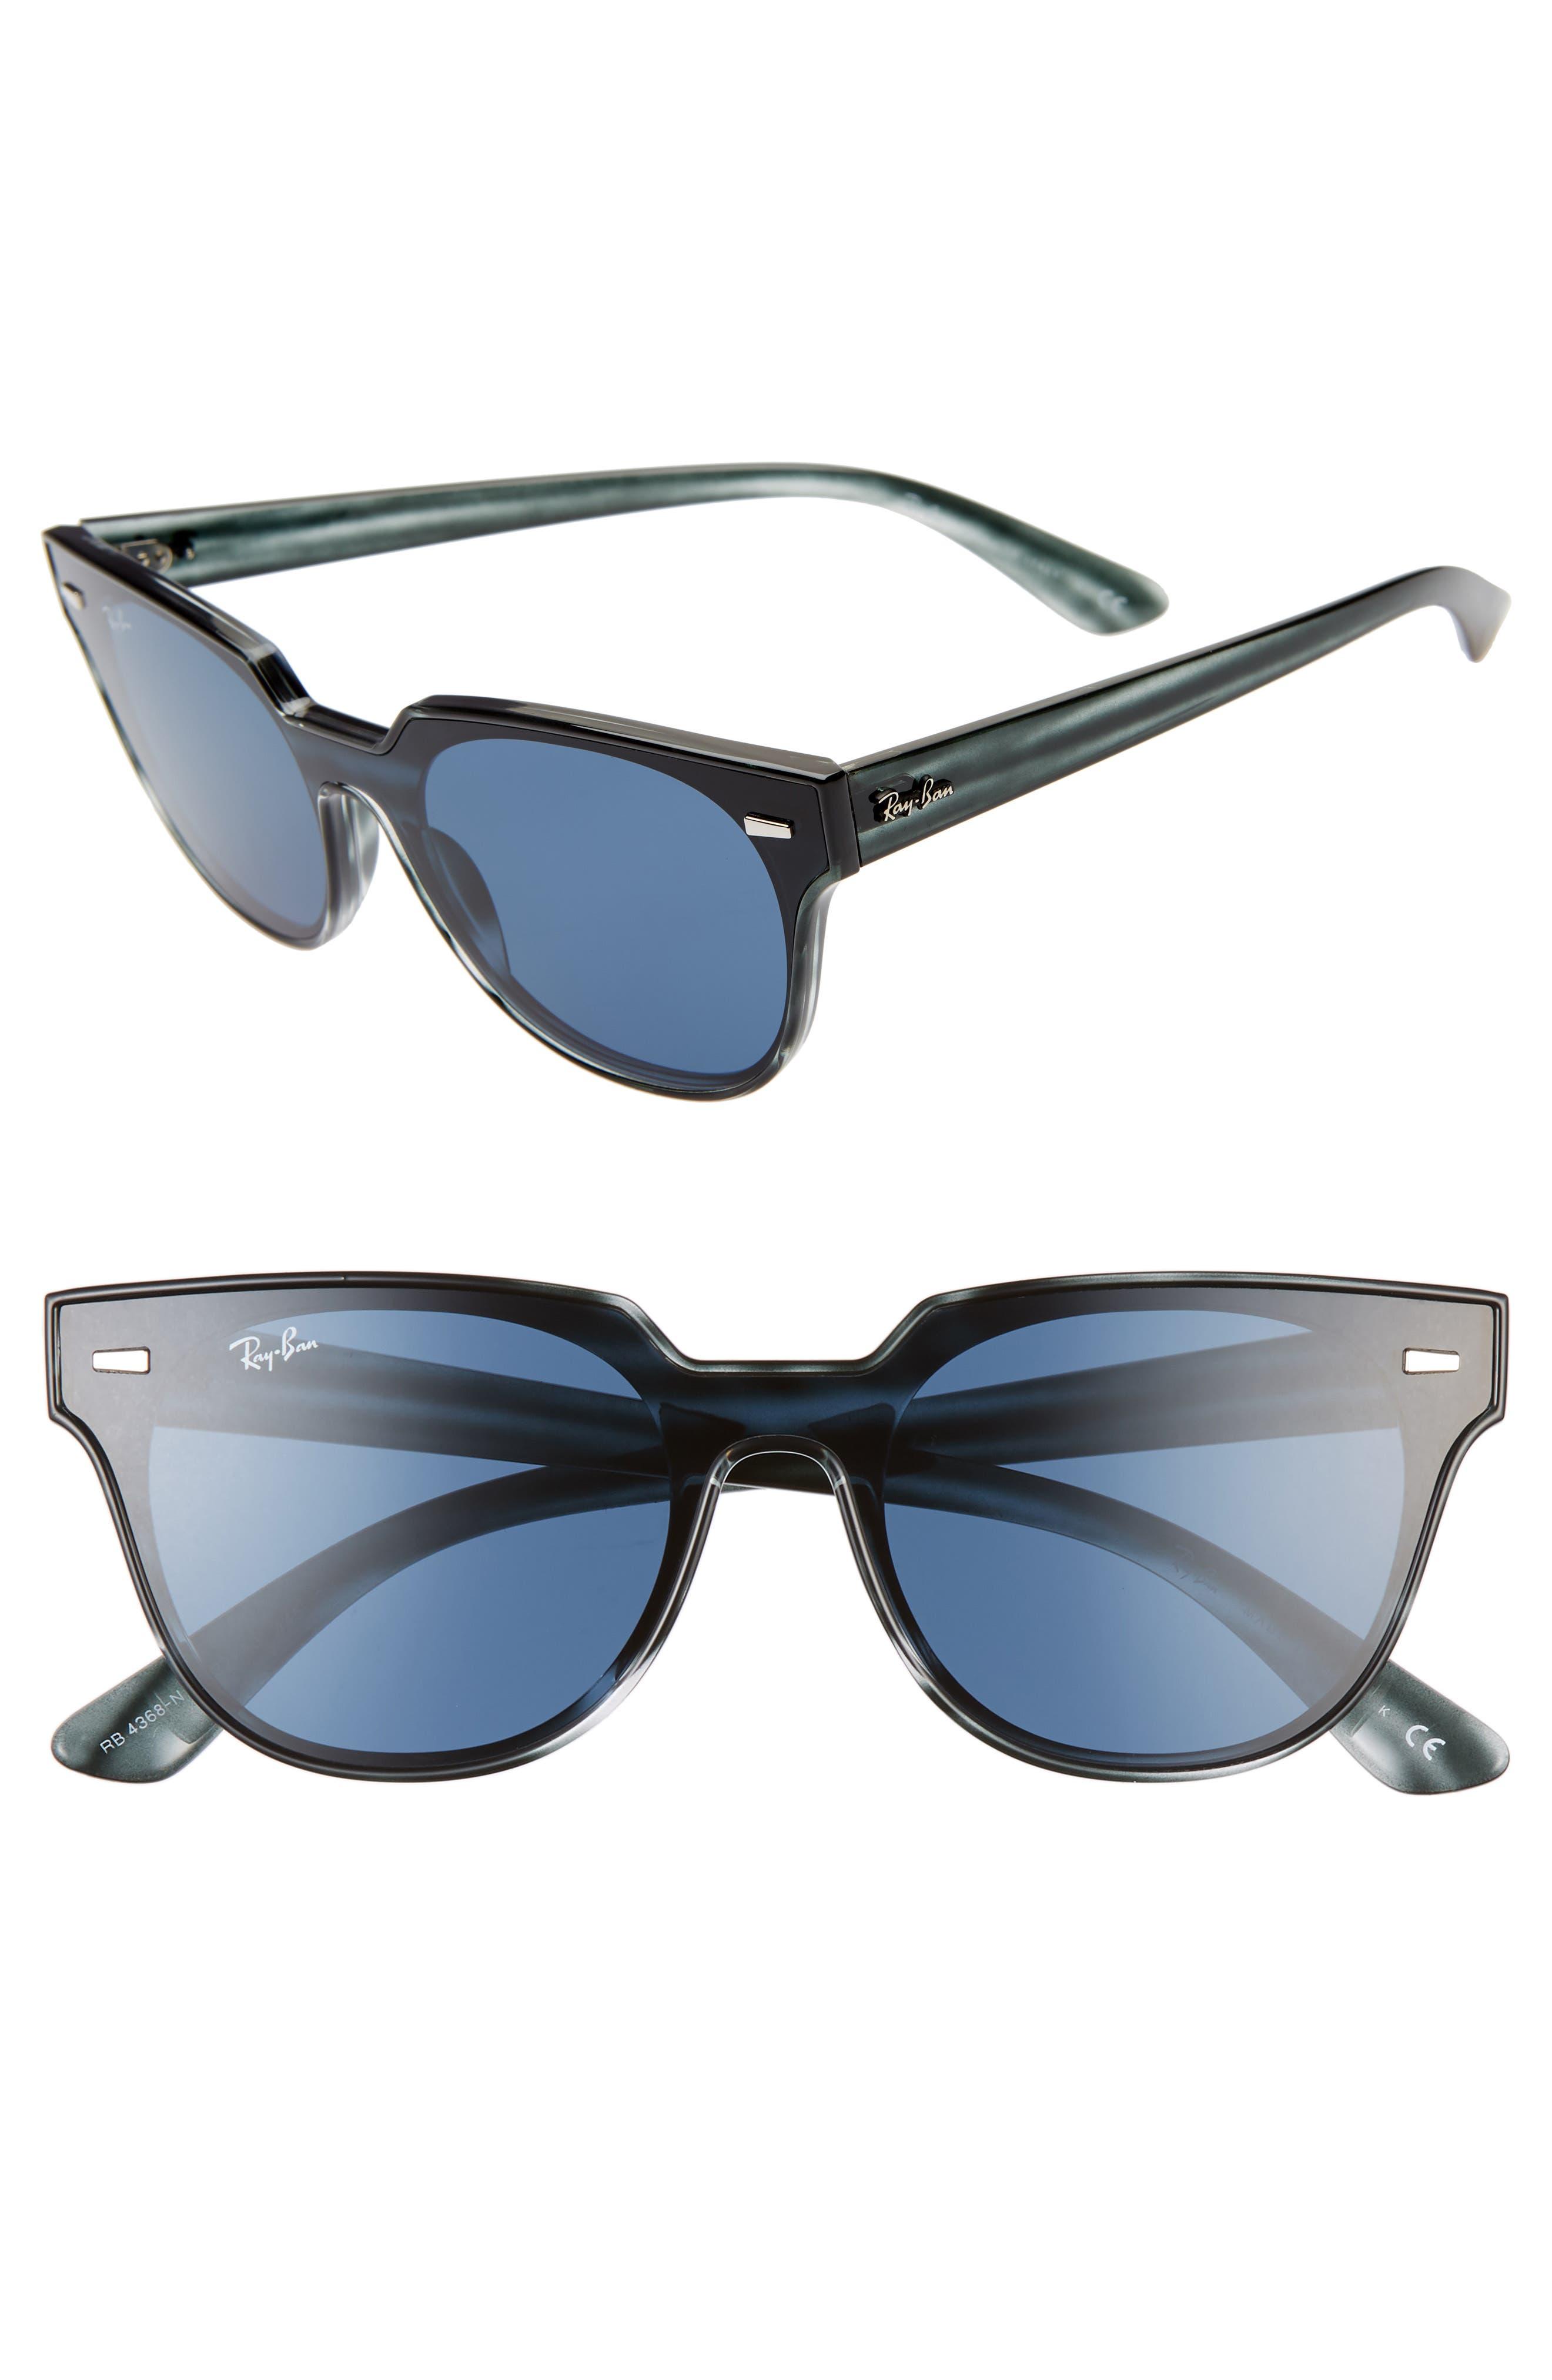 Ray-Ban Wayfarer 51Mm Sunglasses - Striped Blue Havana